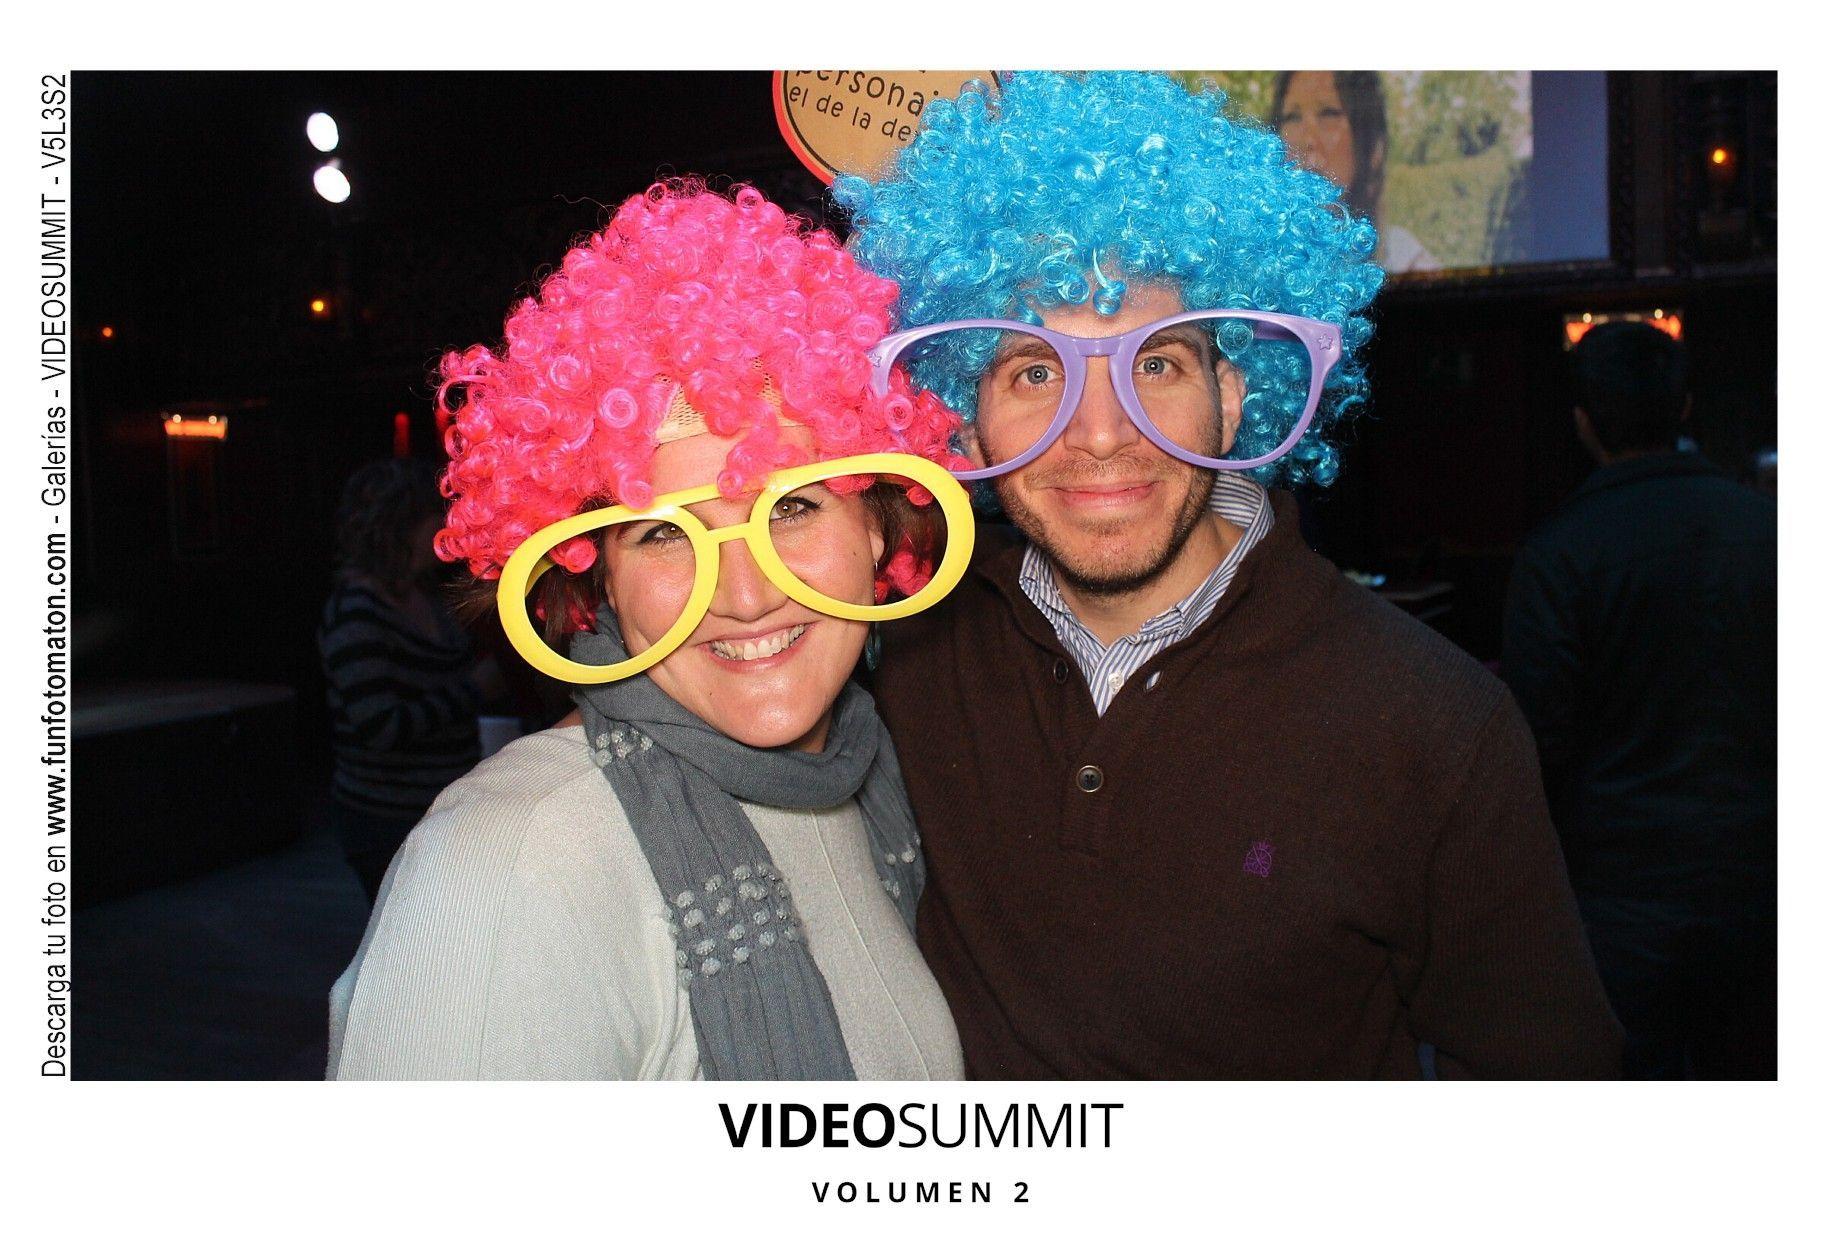 videosummit-vol2-club-party-075